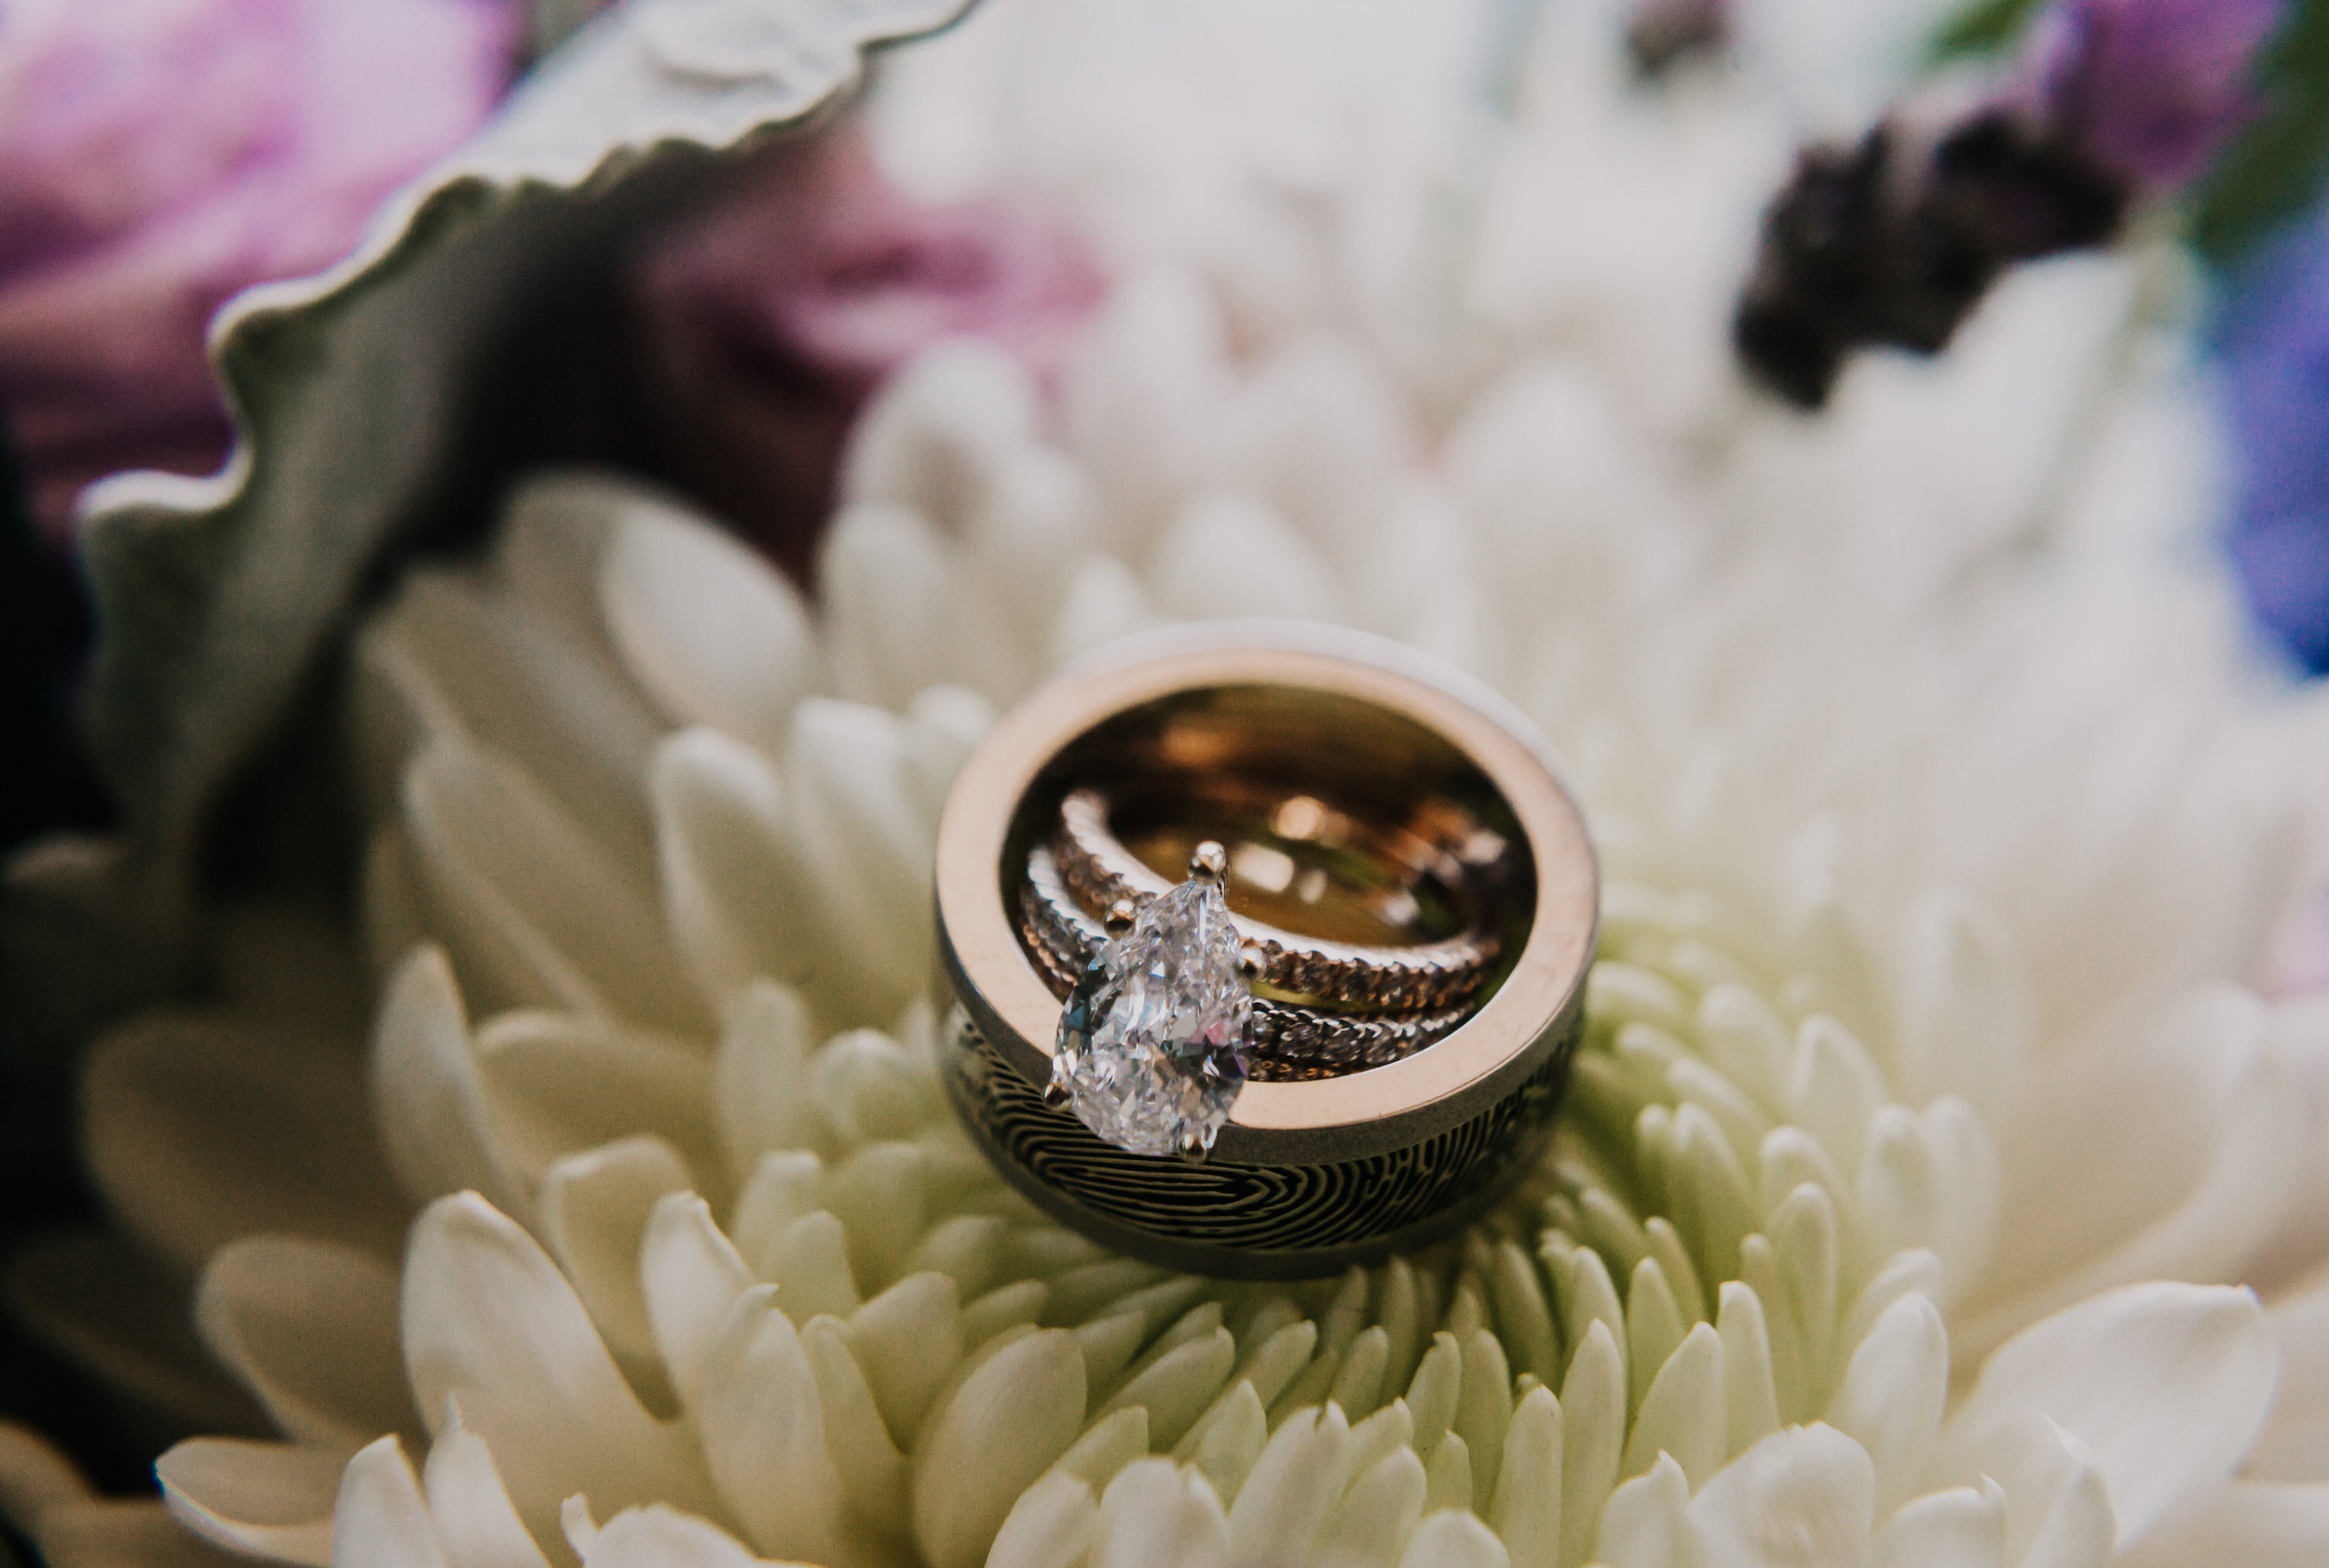 Squamish Wedding Photographer - Sea to Sky Gondola Wedding Photos -  Vancouver Wedding Photographer & Videographer - Sunshine Coast Wedding Photos - Sunshine Coast Wedding Photographer - Jennifer Picard Photography - IMG_1698_1.jpg